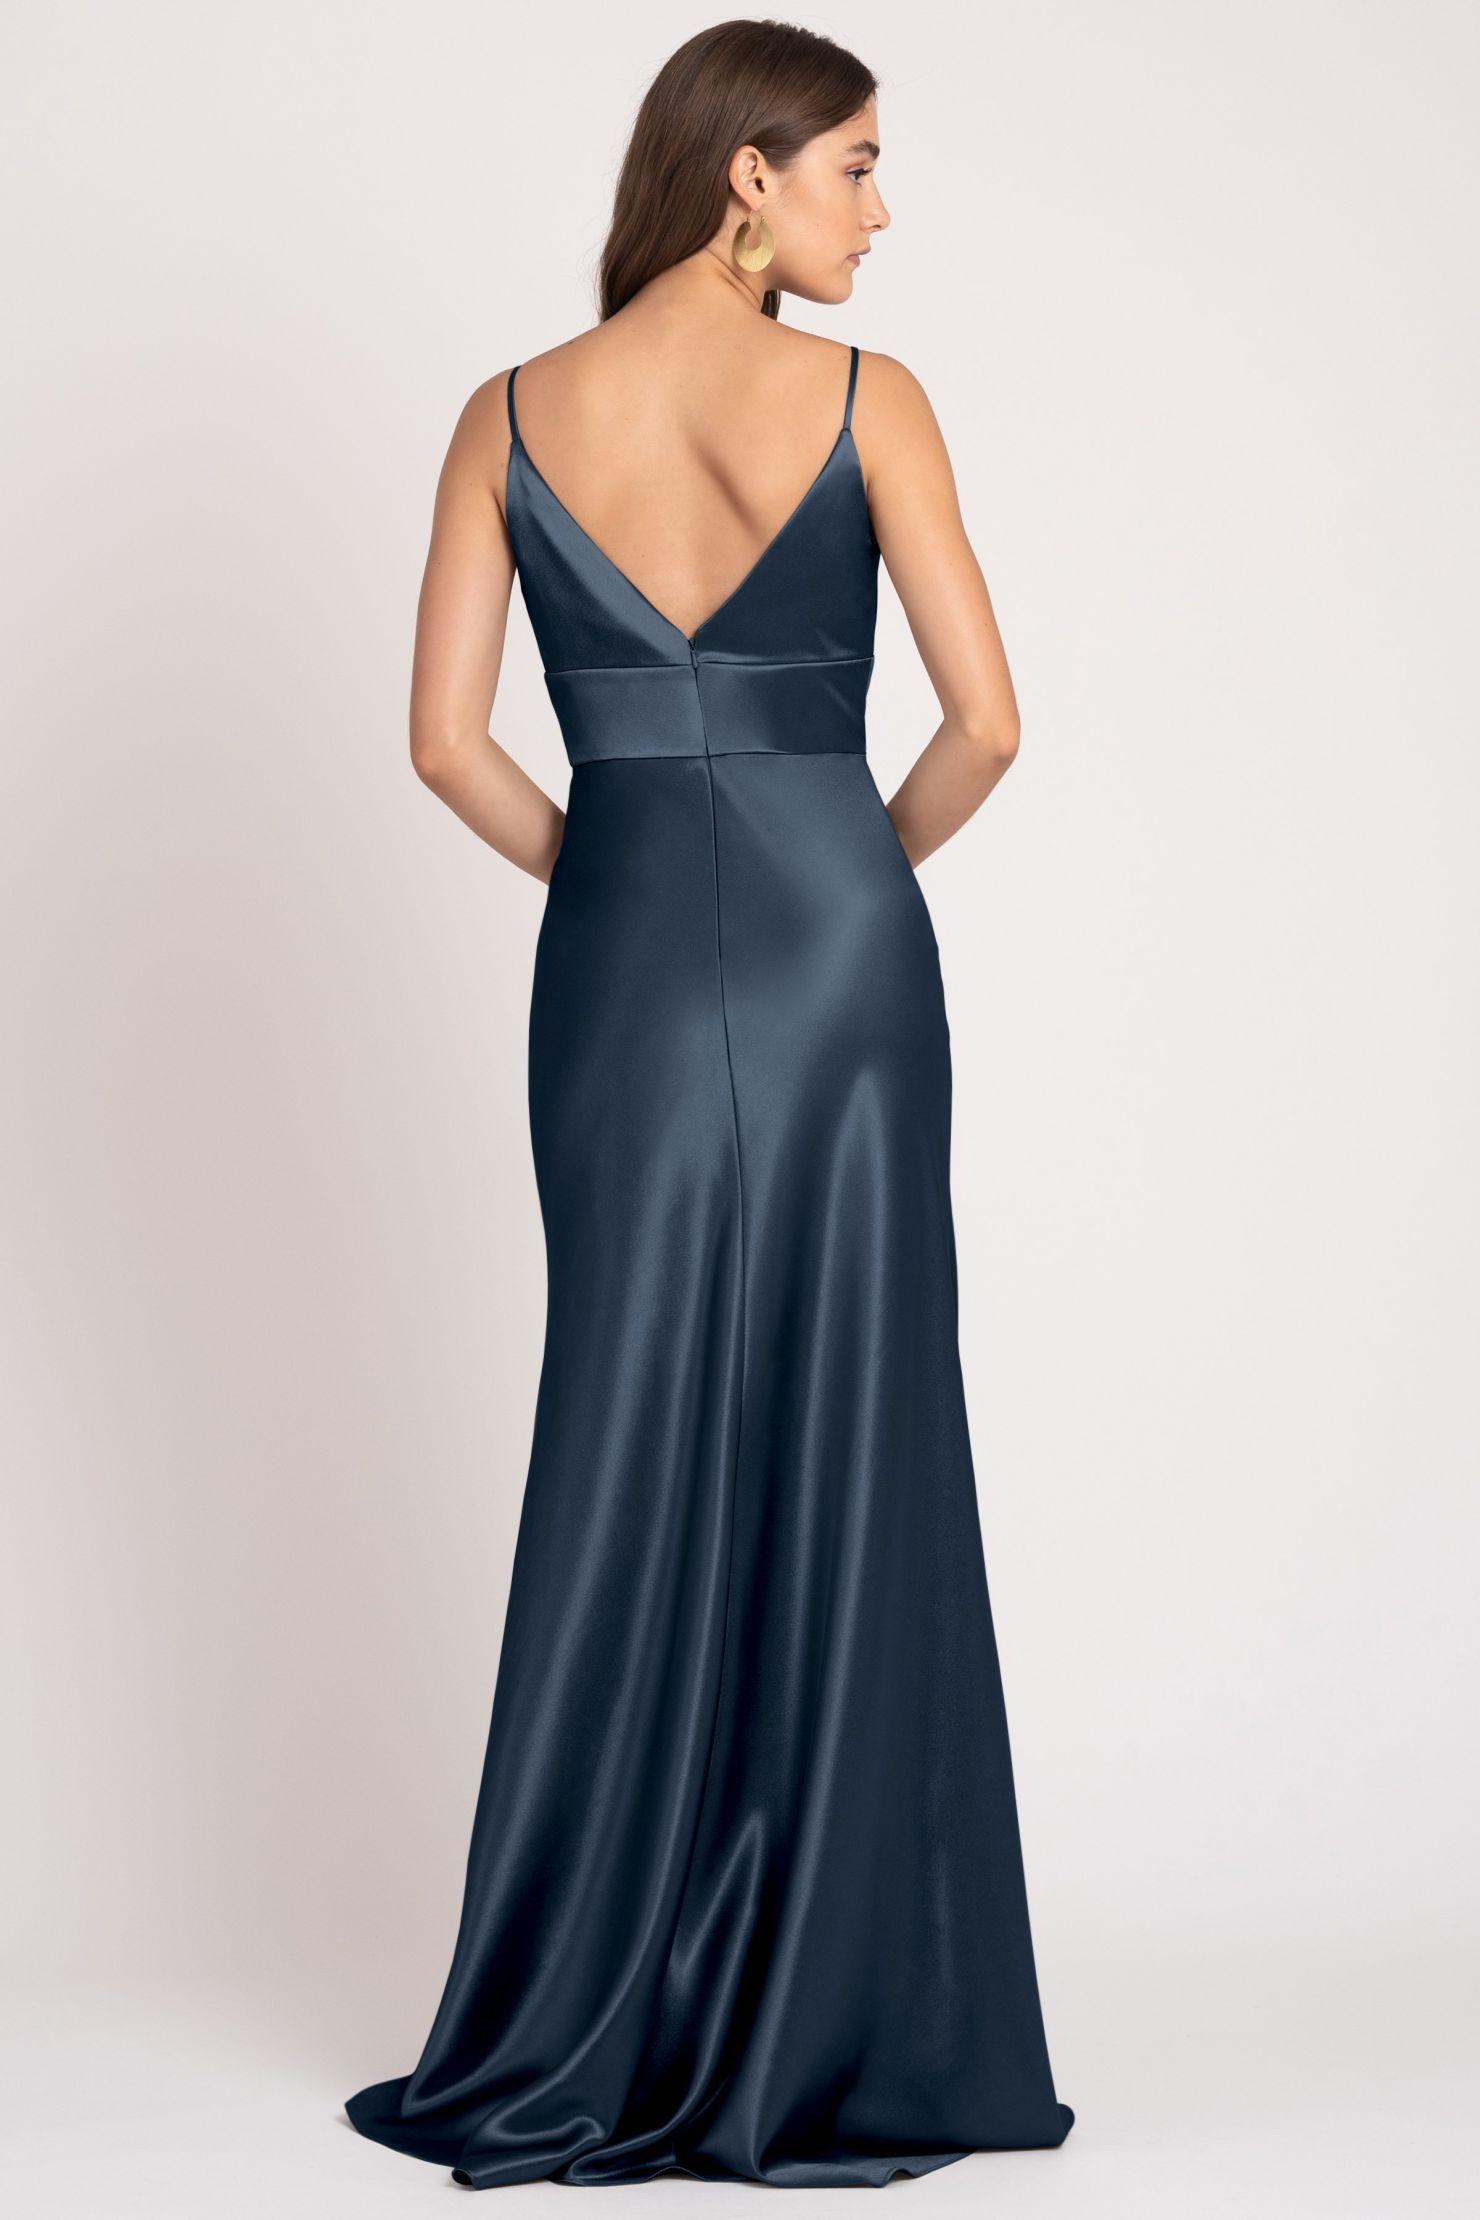 Brenna Bridesmaids Dress by Jenny Yoo - French Blue